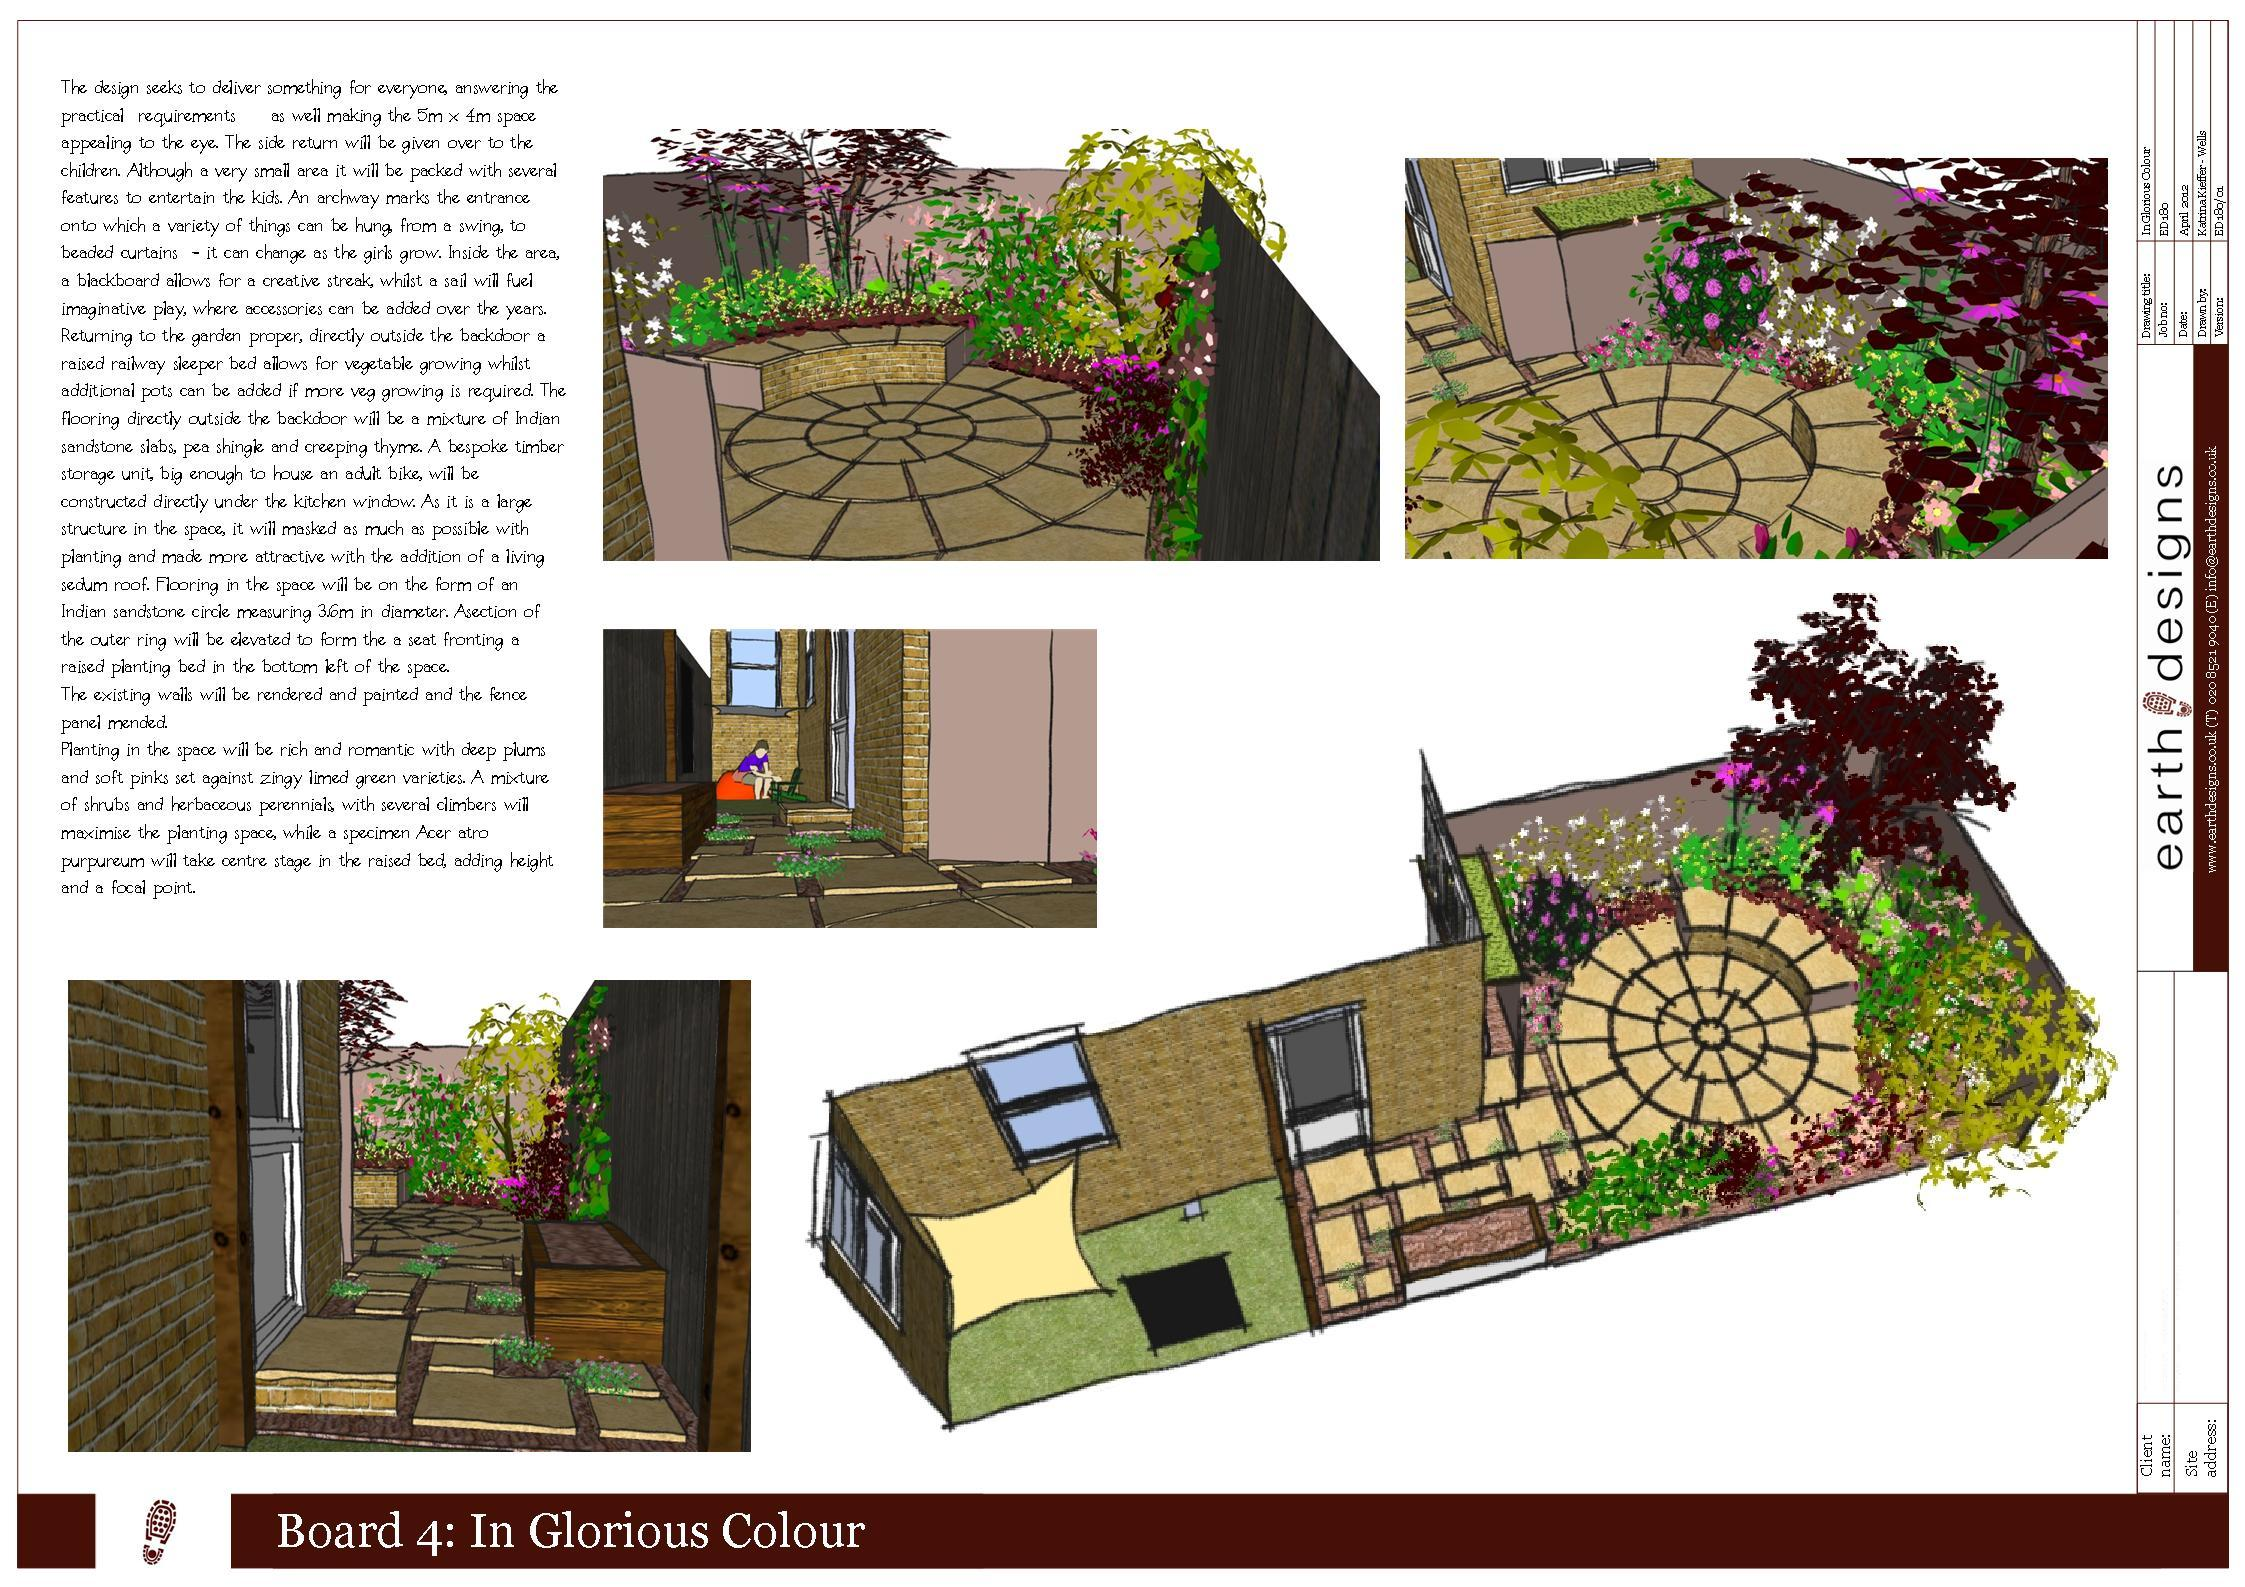 Small Garden Design on a budget - Walthamstow garden packs ...